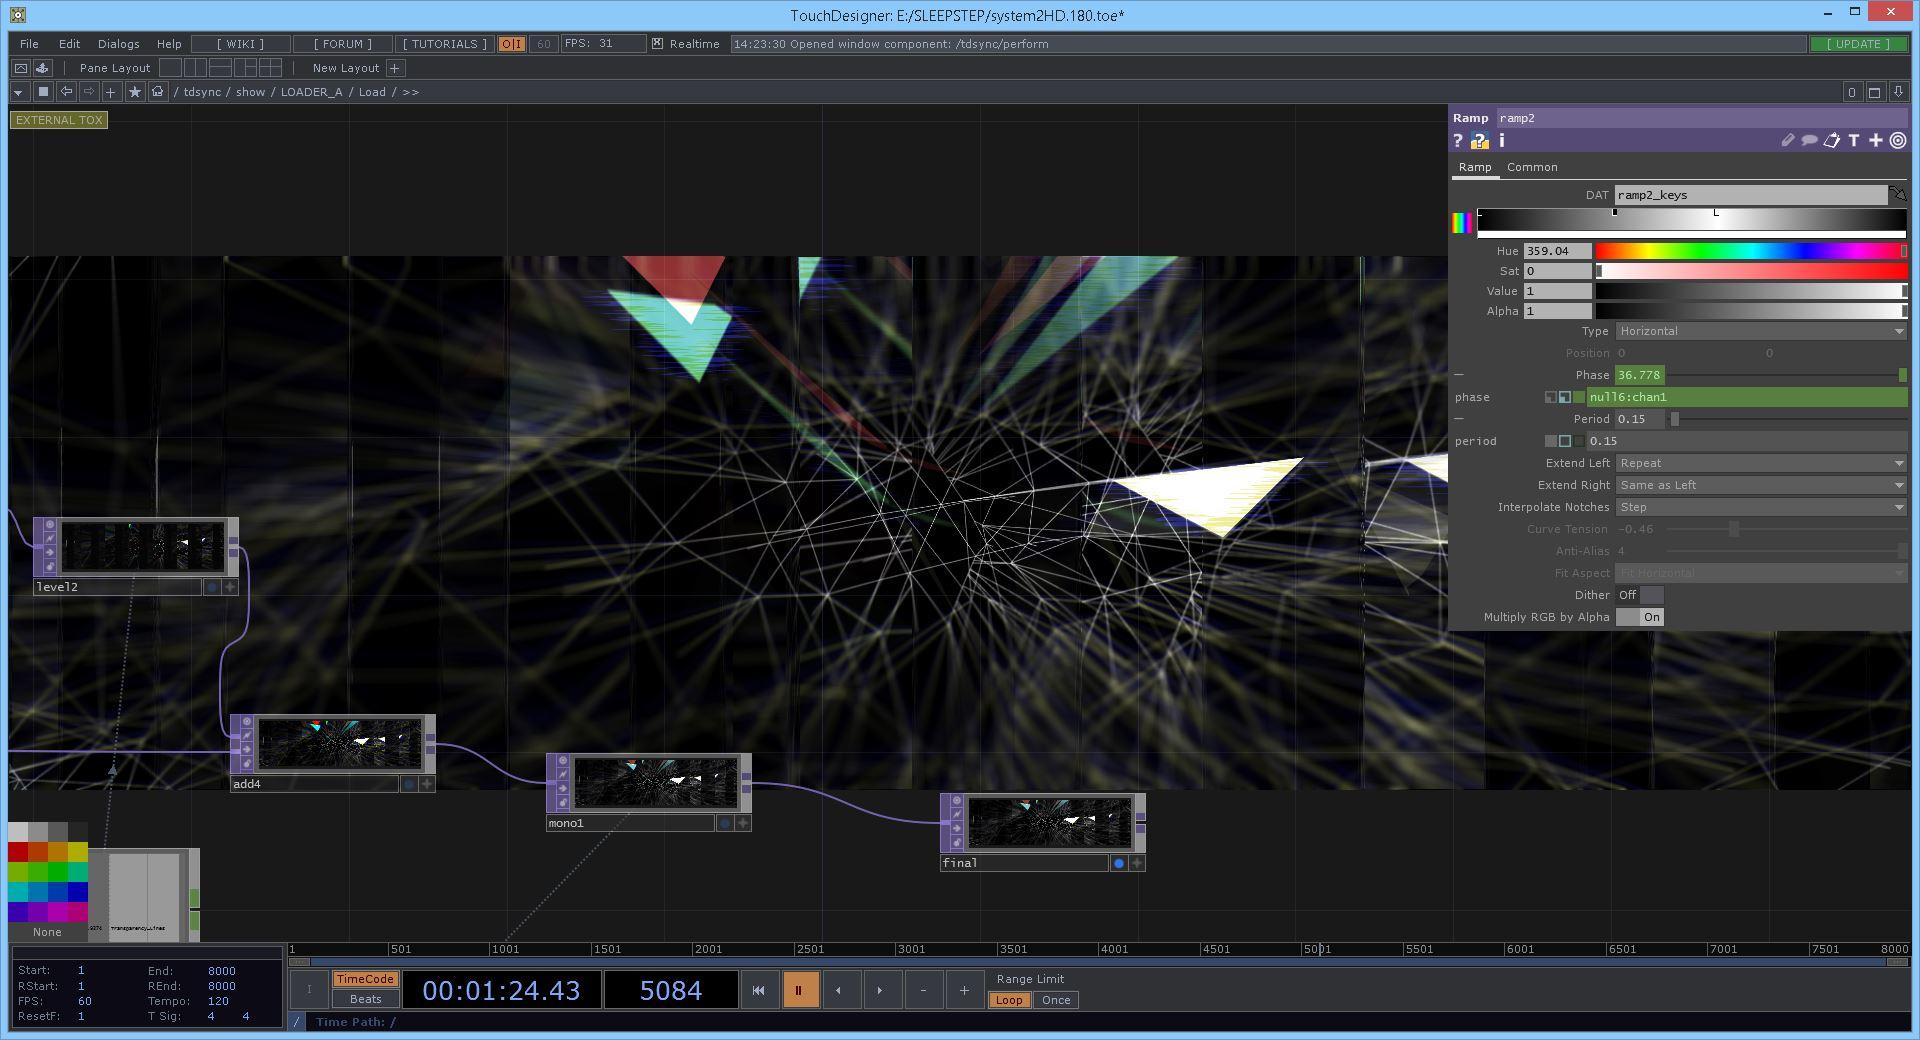 SOP on GPU - Geometry Shaders in TouchDesigner - 17 OCT 2018